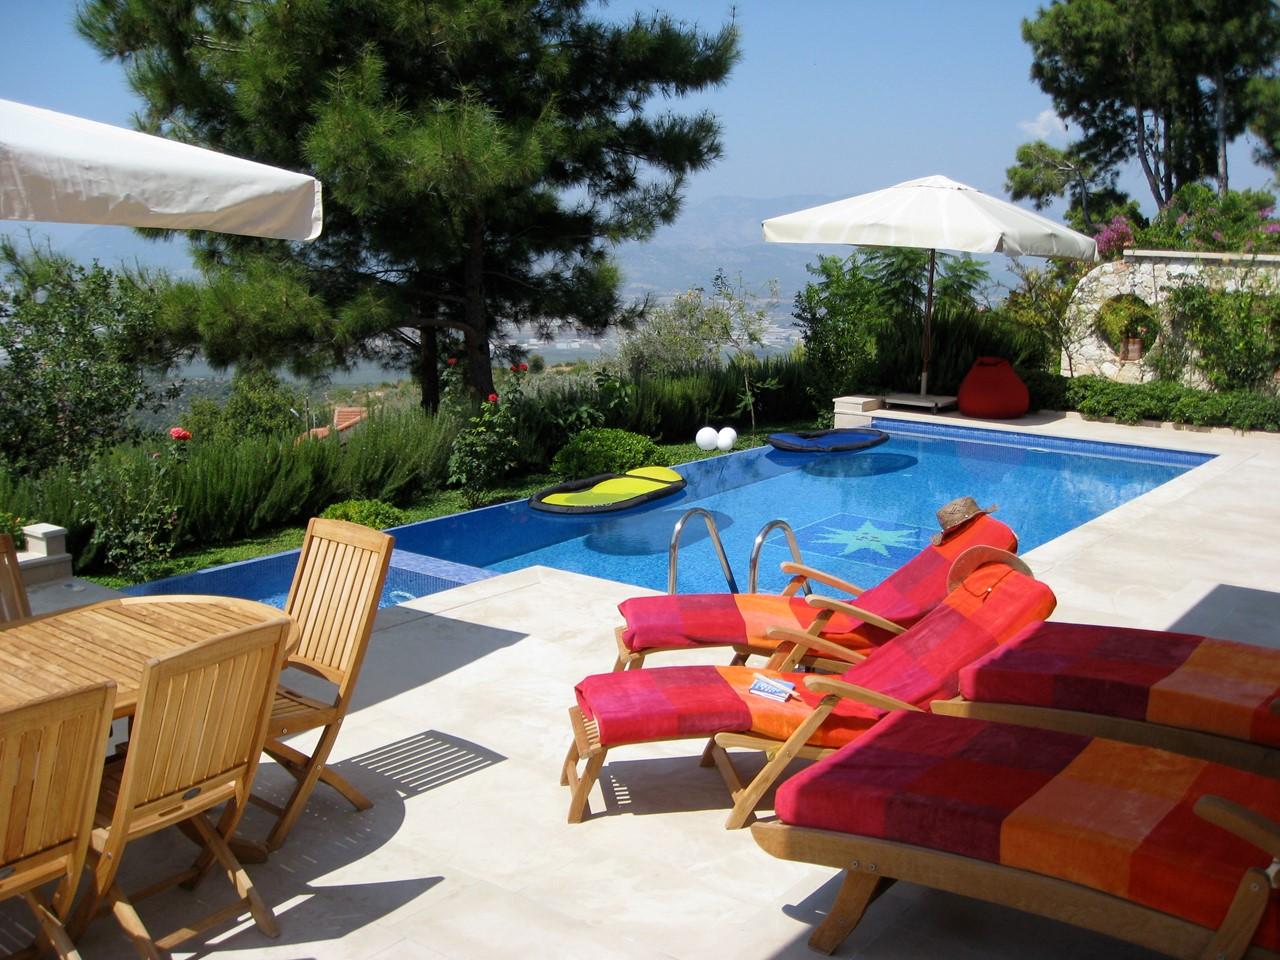 Sunbathe by the pool